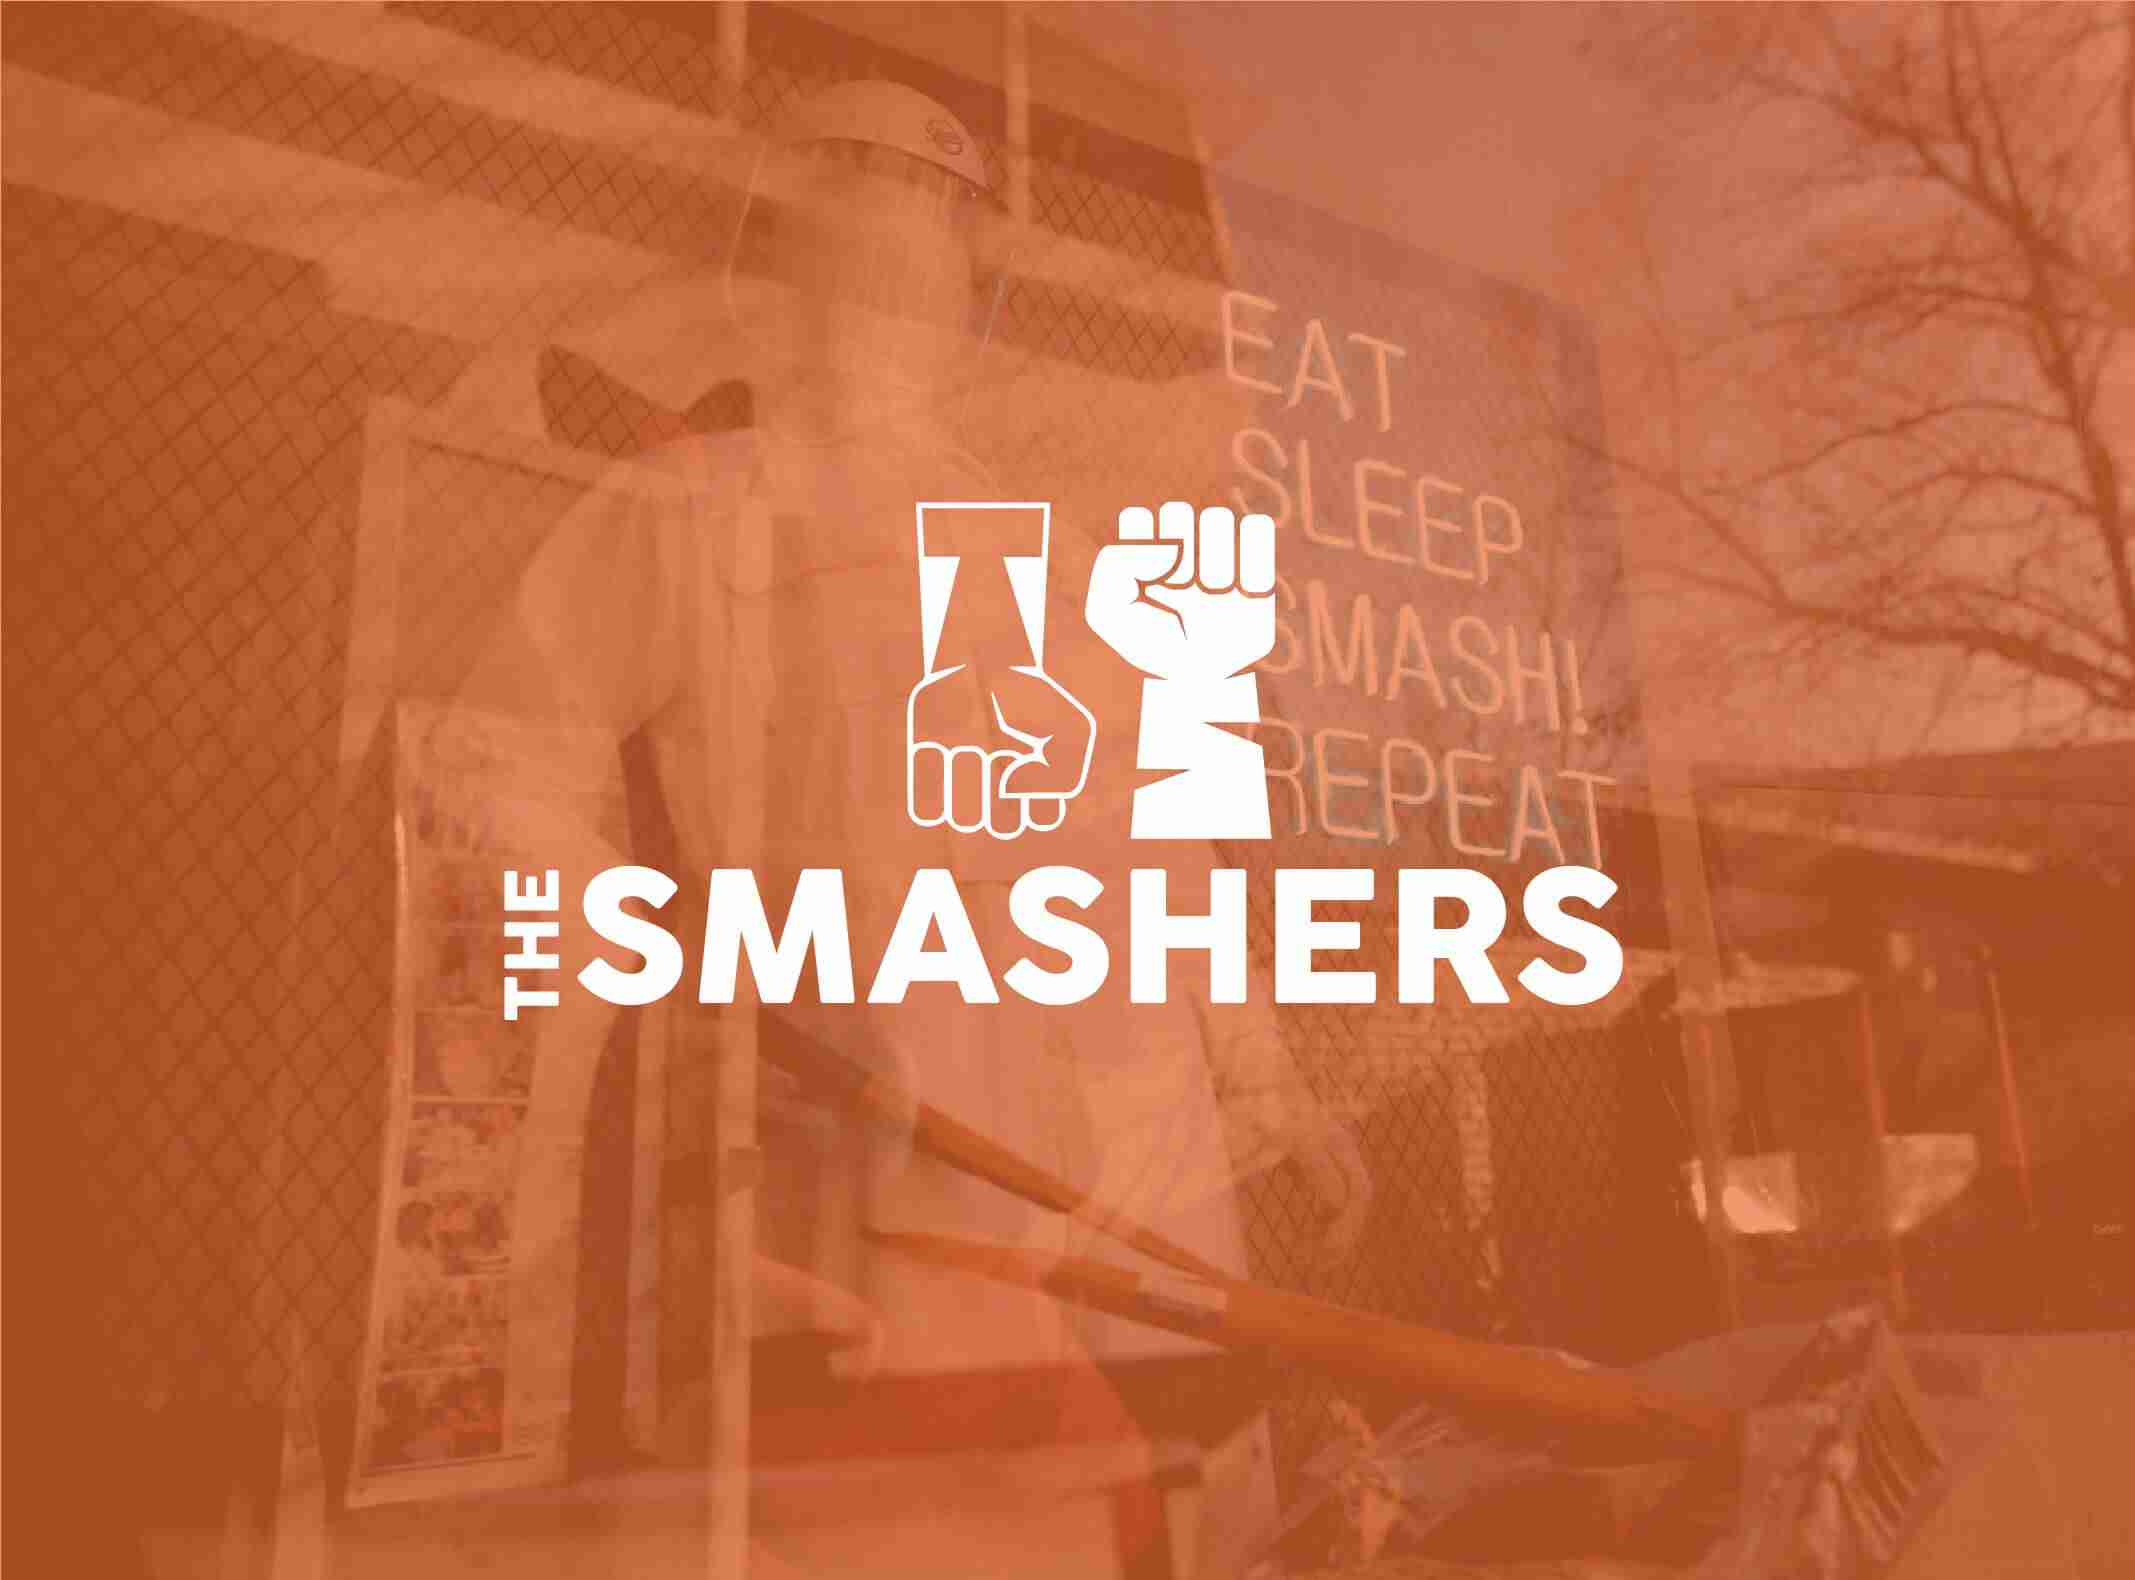 THE SMASHERS